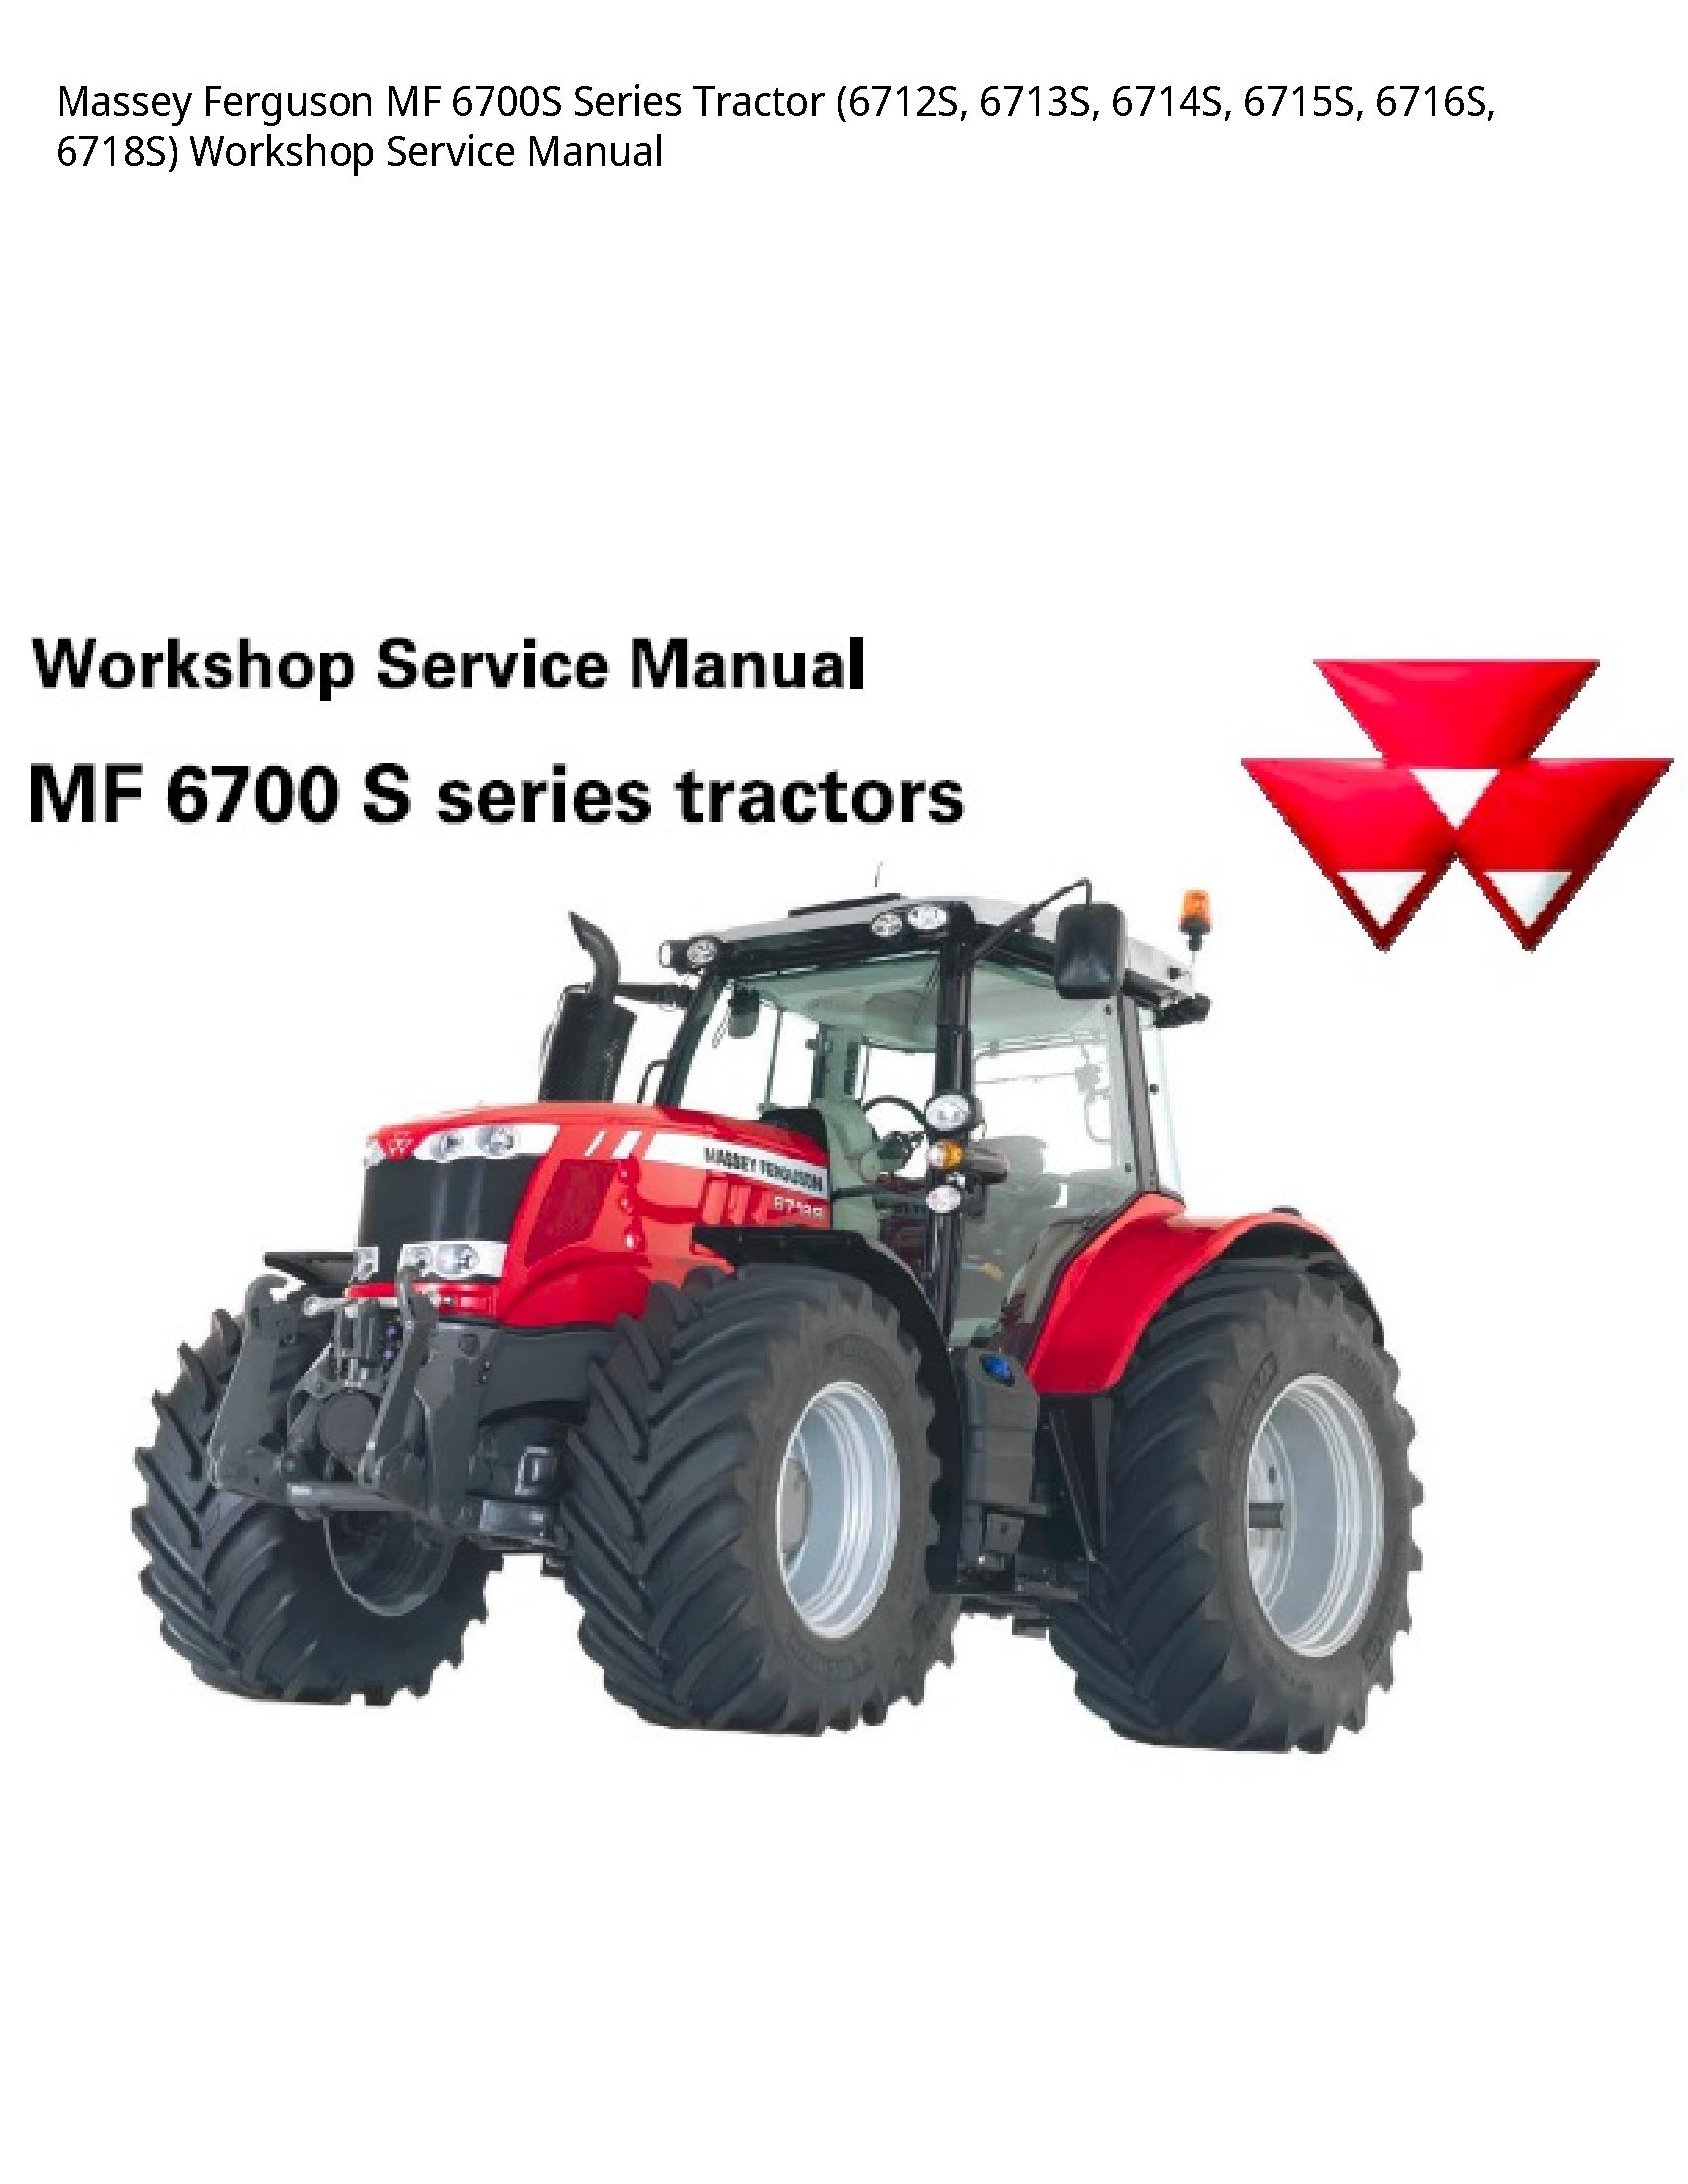 Massey Ferguson 6700s Mf Series Tractor Service Manual Tractors Massey Ferguson Repair Manuals